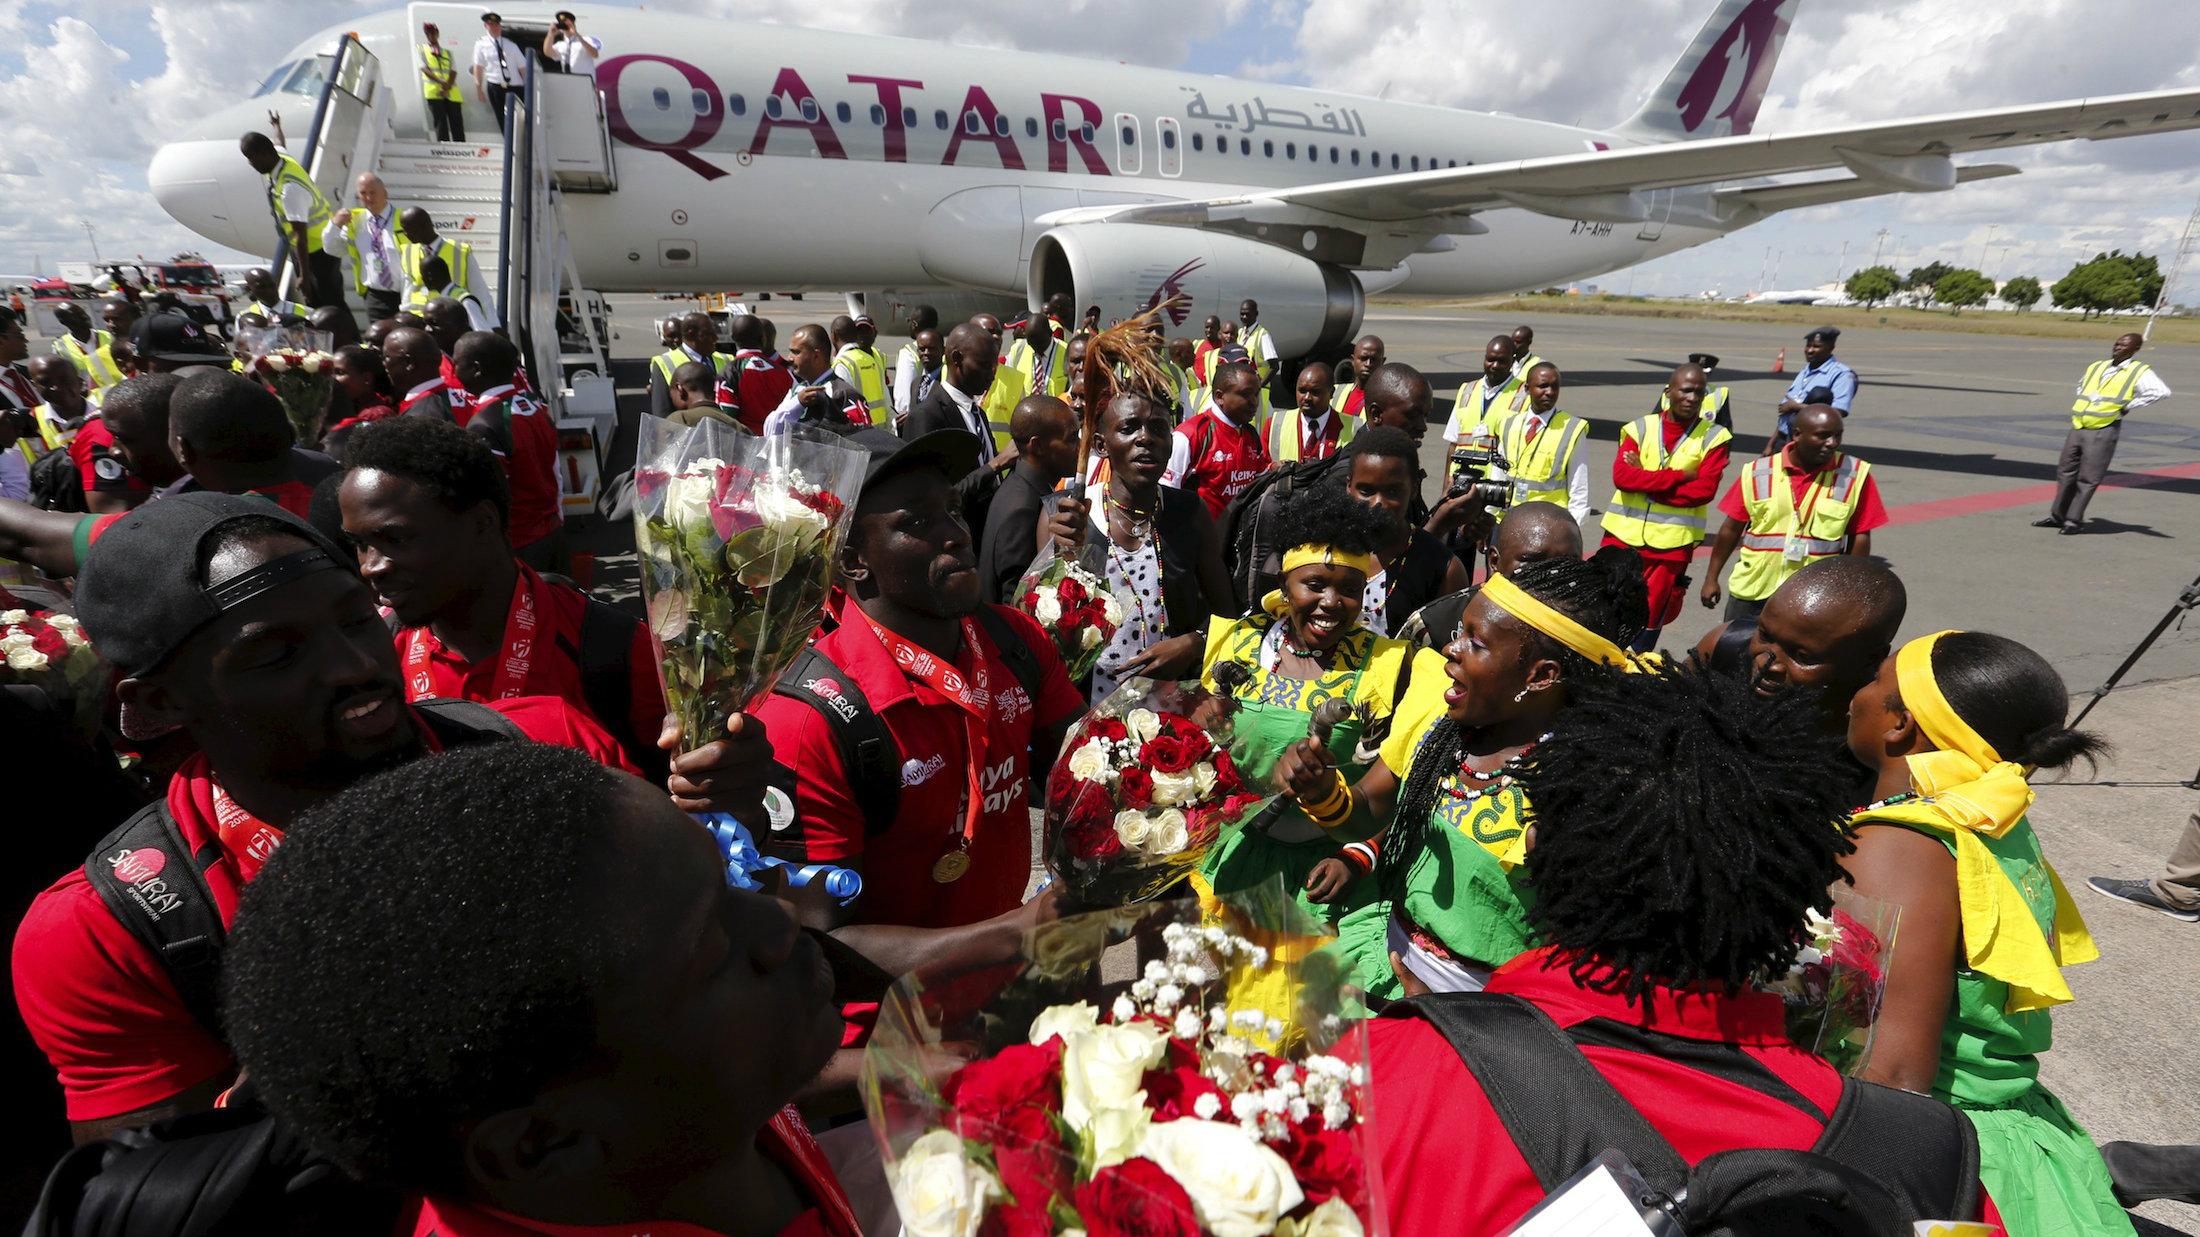 Kenya's rugby team returns home on a Qatar Airways flight